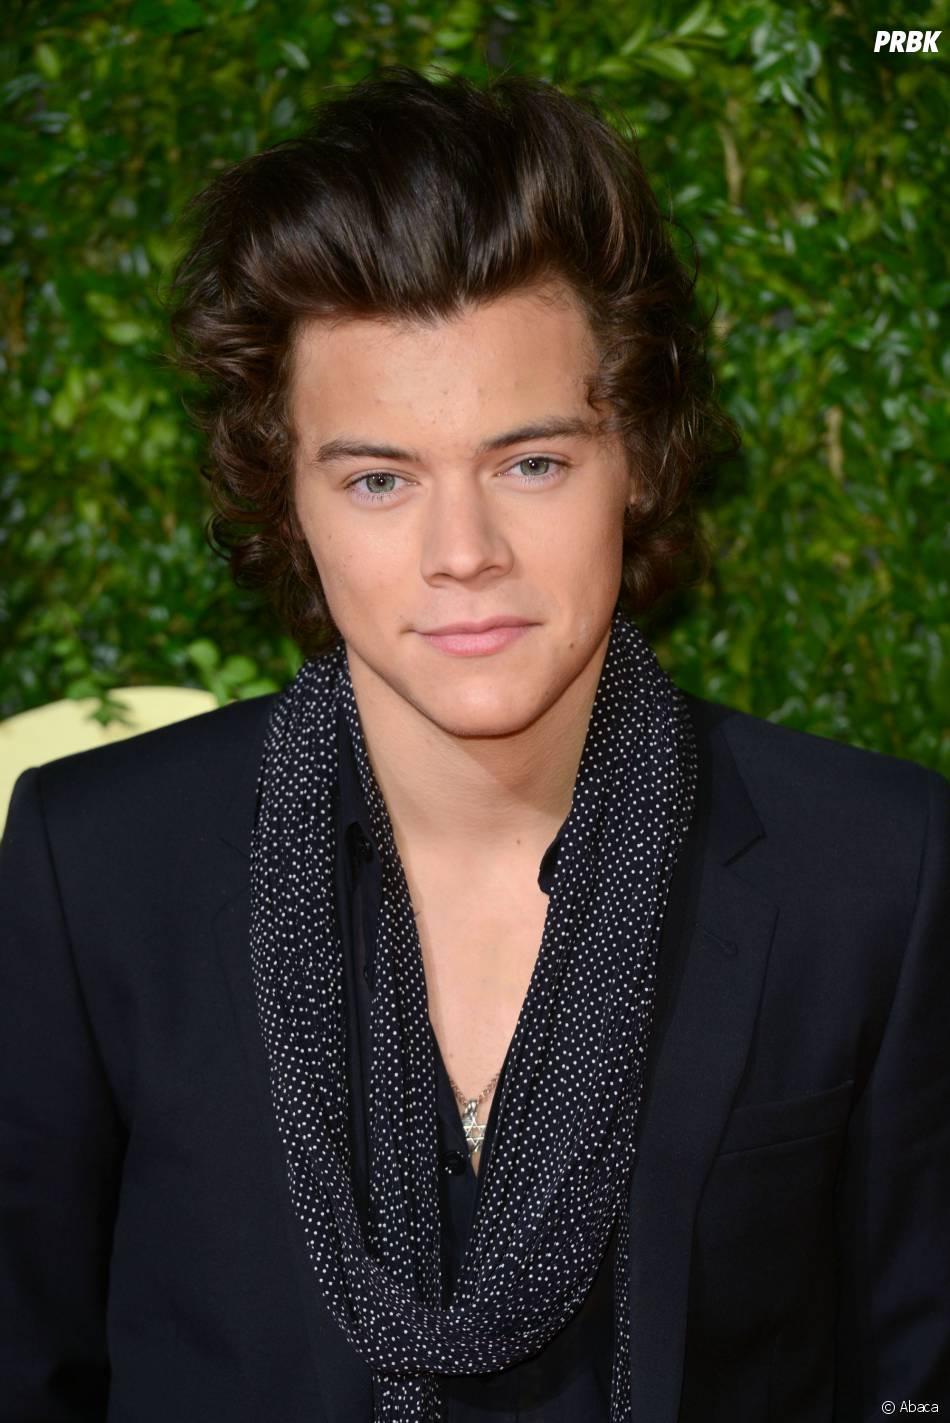 Harry Styles et Kendall Jenner : câlin et bisou en plein concert